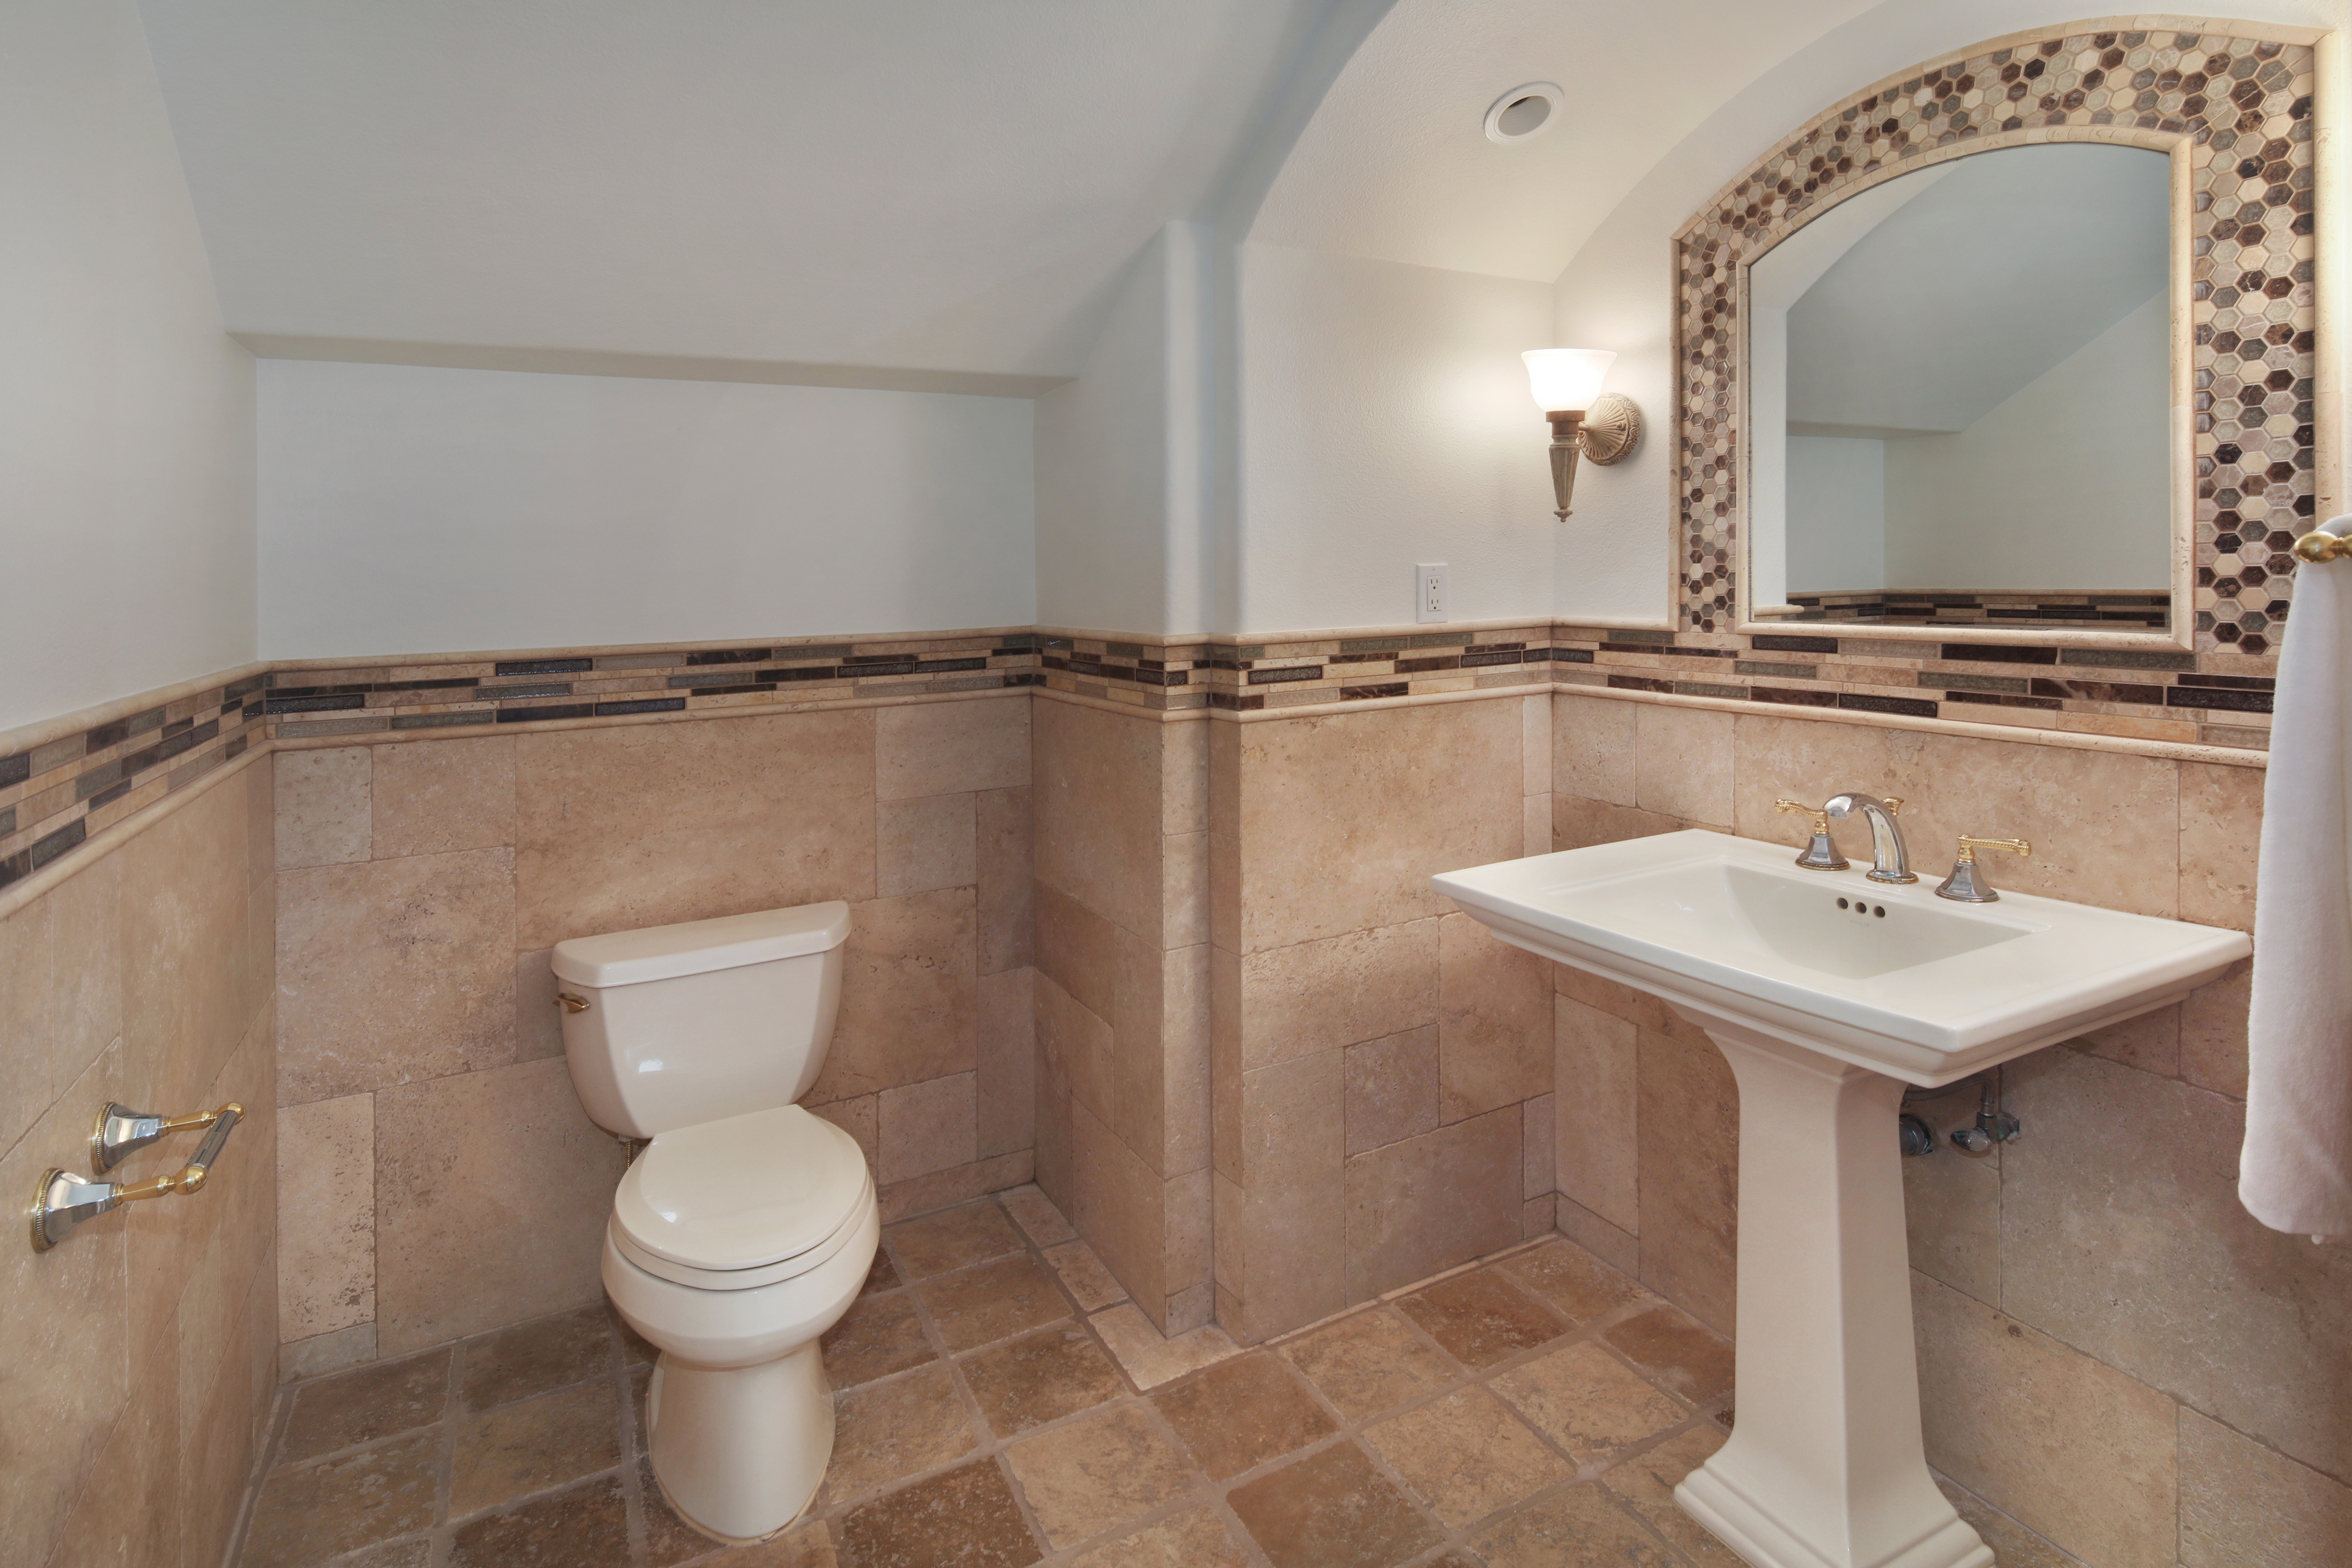 Picture Toilet Interior Mirror Design wc restroom toilet room